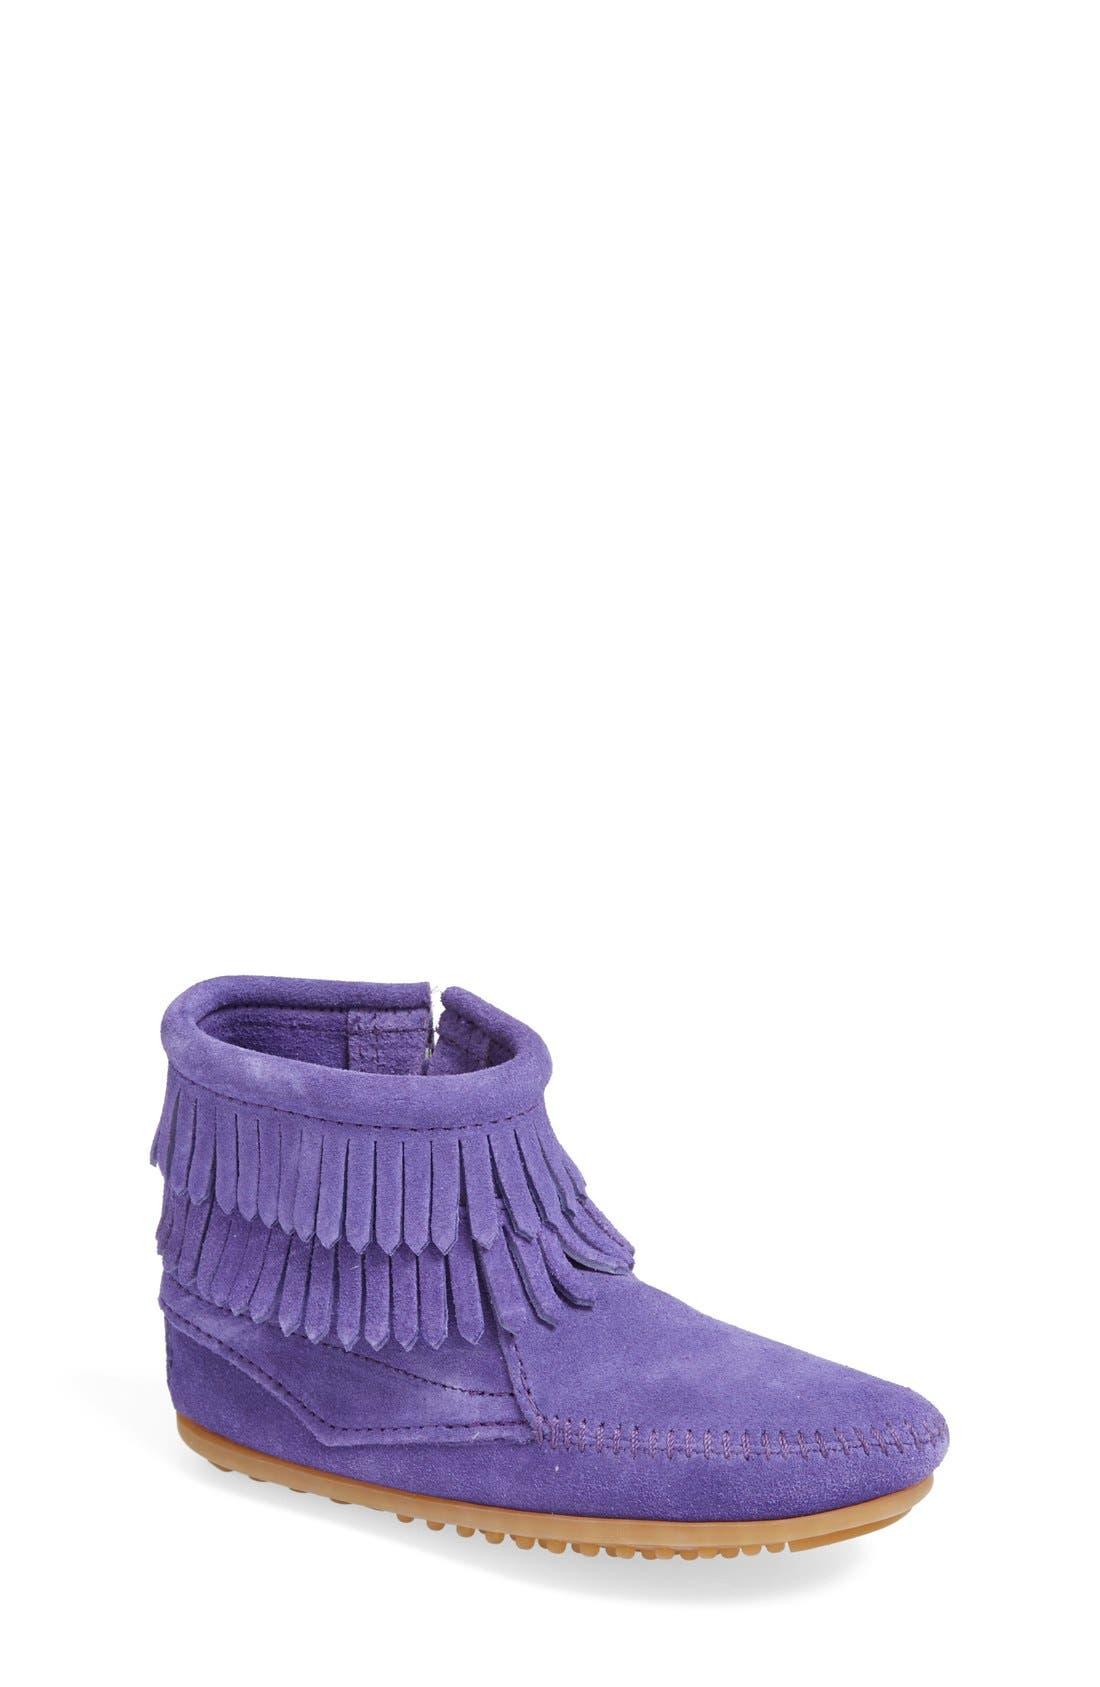 'Double Fringe' Boot,                         Main,                         color, PURPLE